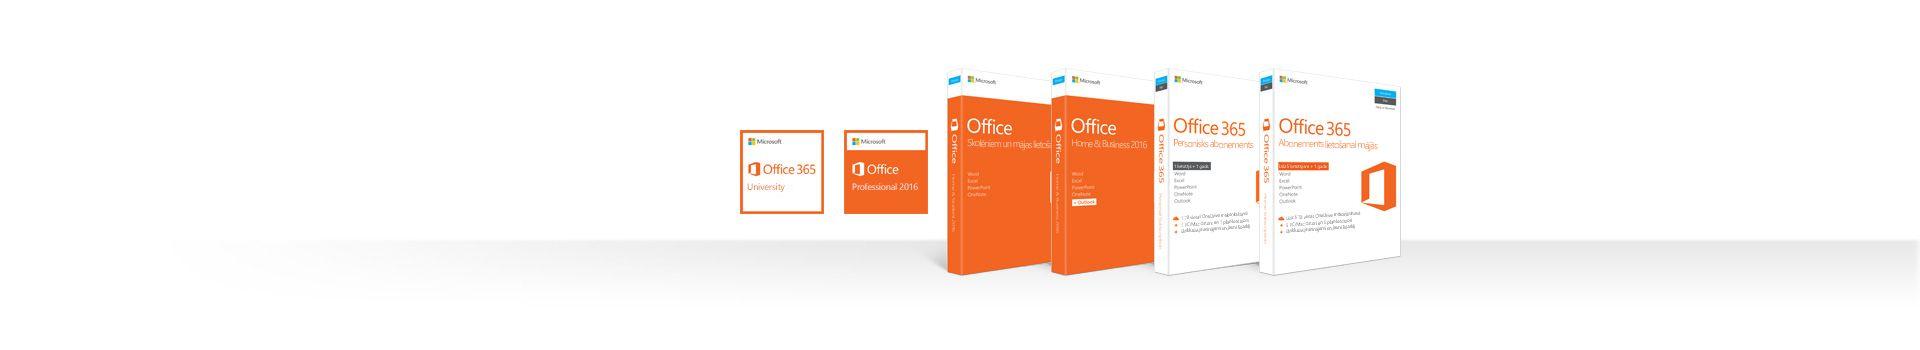 Office2016 un Office365 produktu PC datoram lodziņu rinda